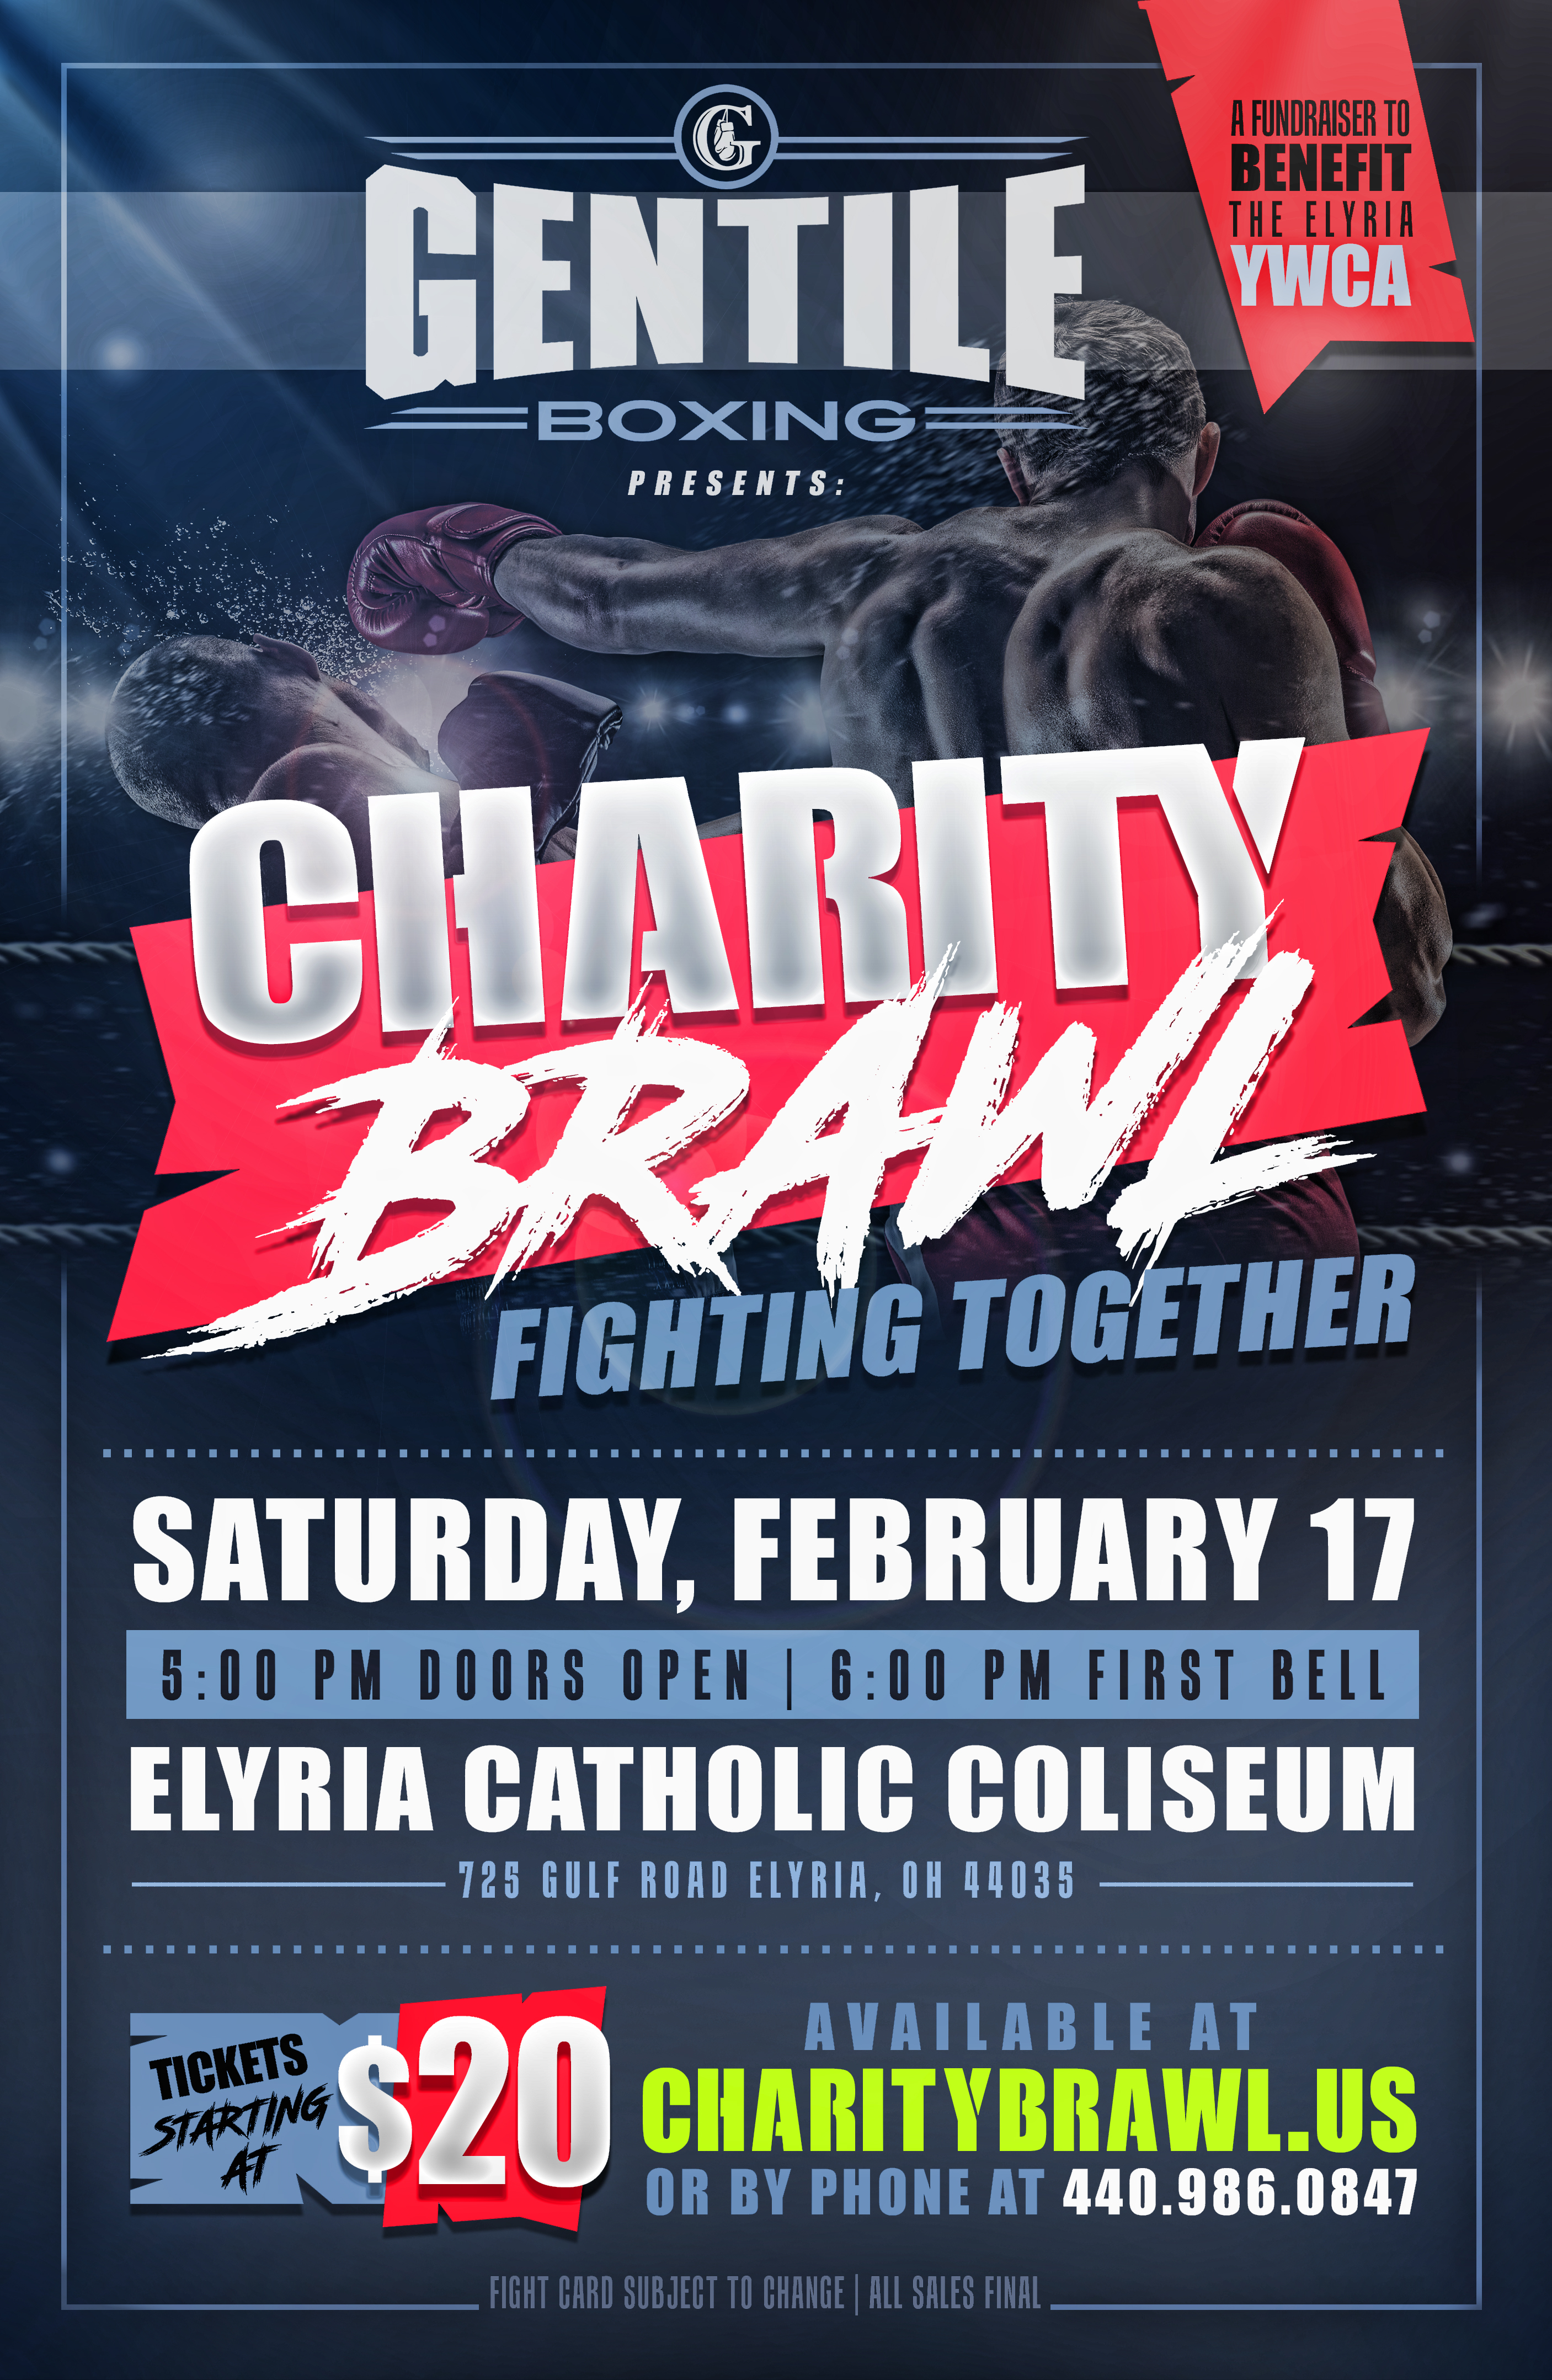 Fundraiser Brings Boxing to Elyria Catholic This Saturday Night